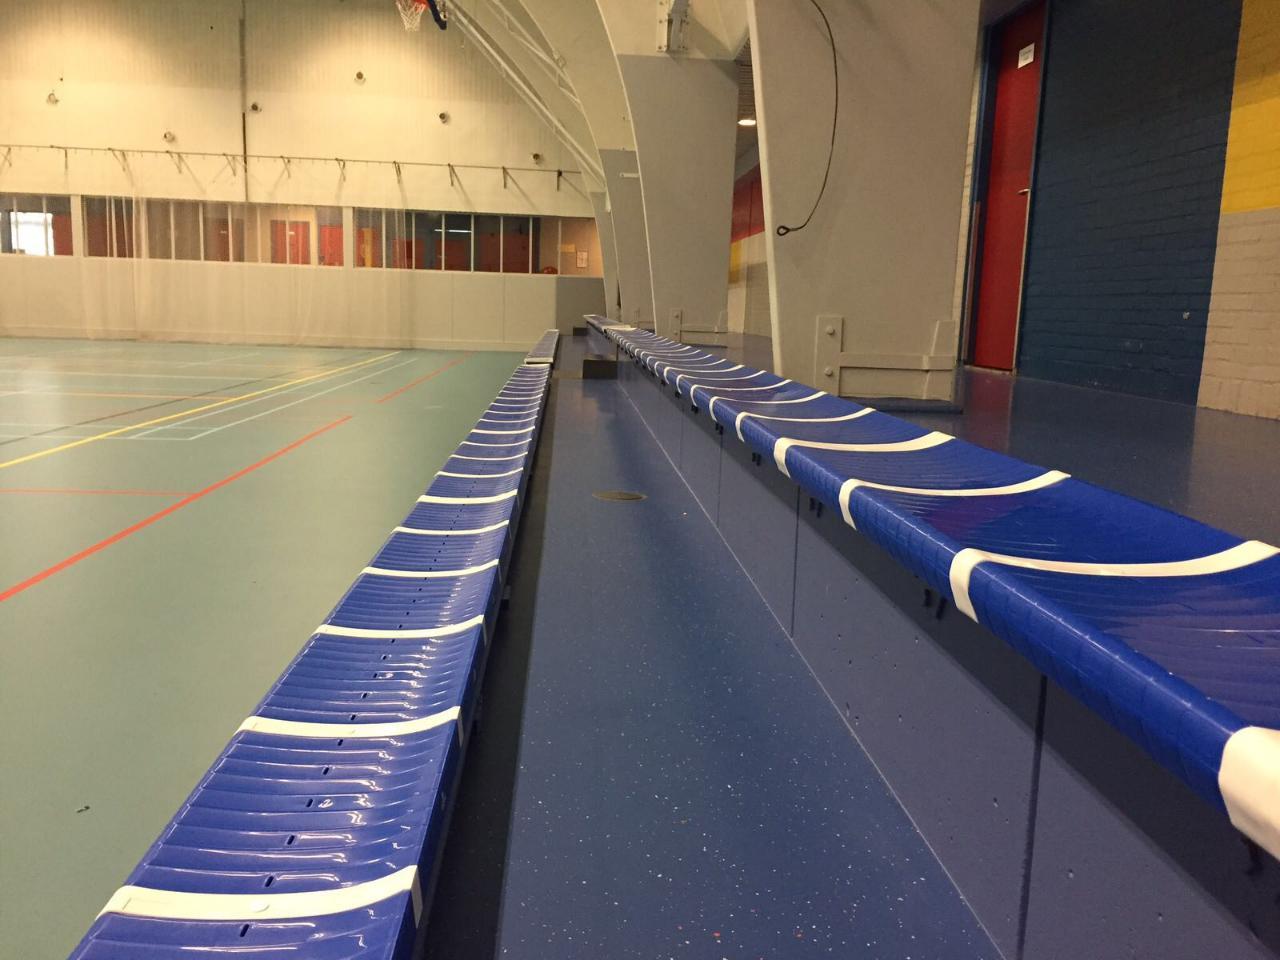 Stadion-/tribunestoel G3